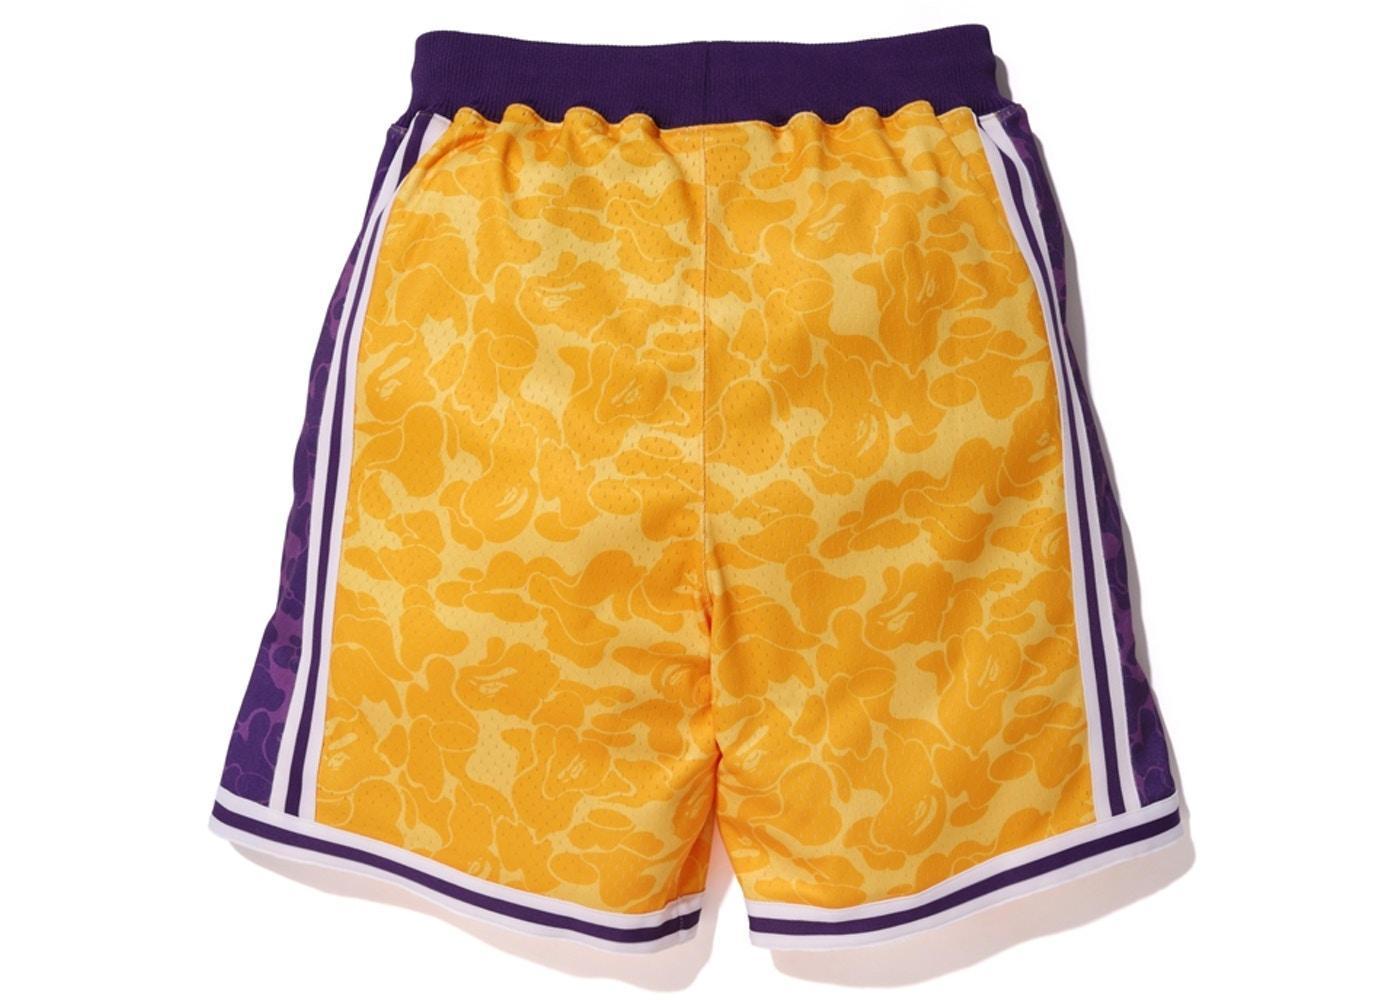 Купить баскетбольные шорты Bape x Mitchell & Ness Lakers ABC Basketball Authentic Shorts Yellow